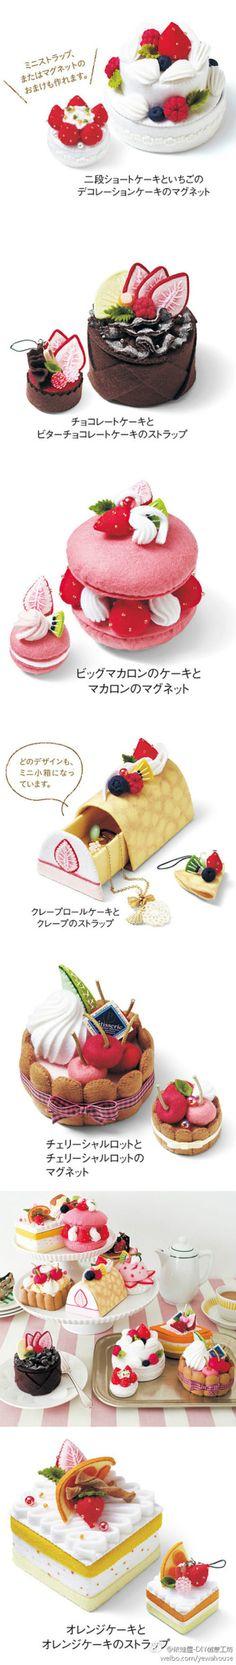 All Kinds of Dessert Soft Toys.  ❤